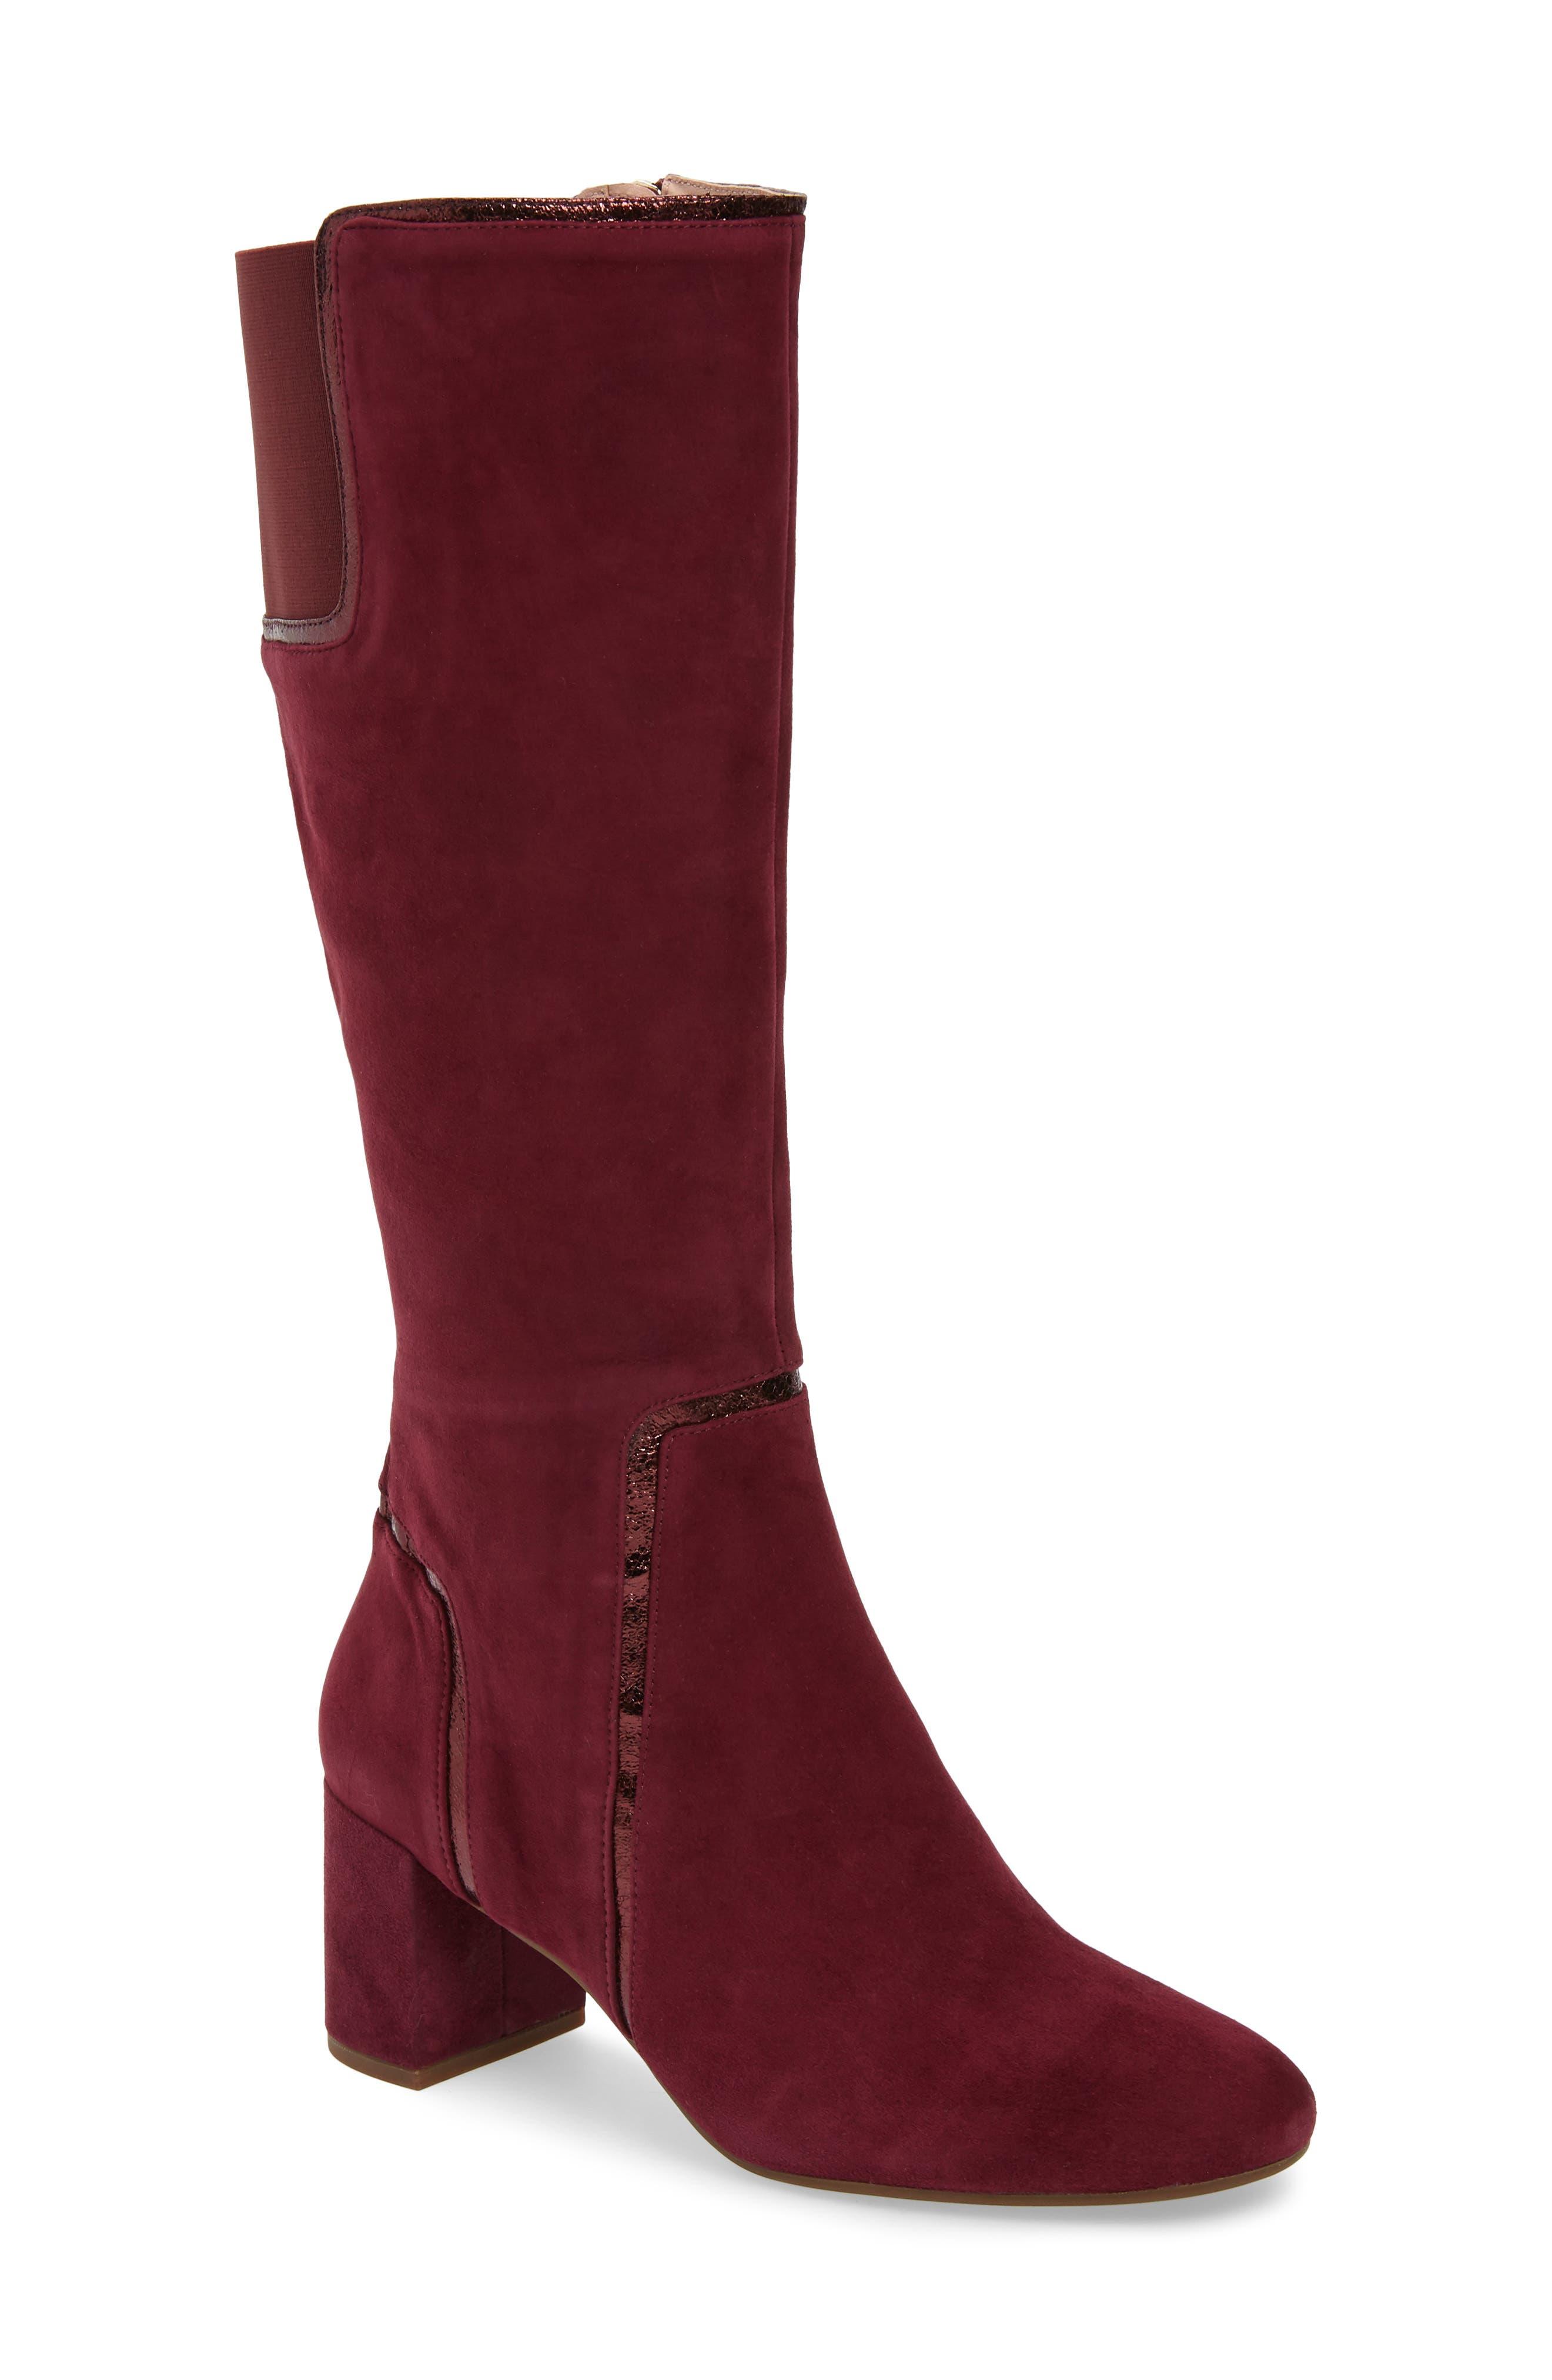 TARYN ROSE Charlee Knee High Boot, Main, color, FIG SUEDE